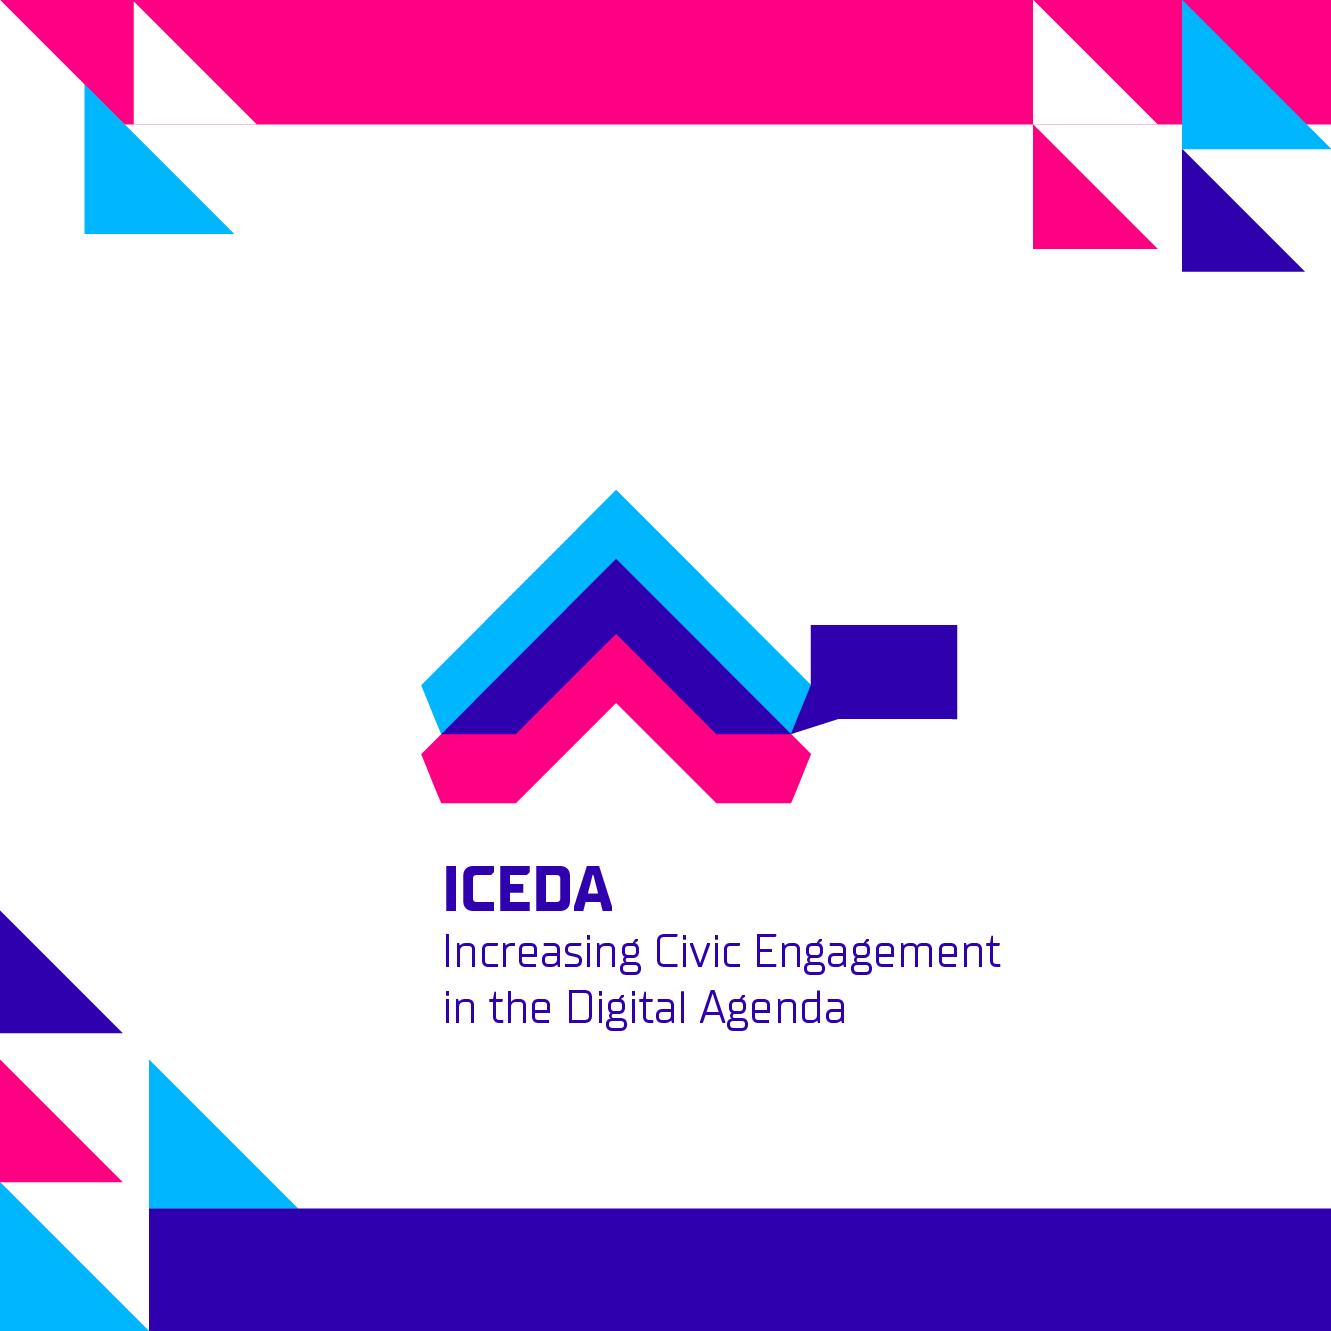 Increasing Civic Engagement in the Digital Agenda – ICEDA